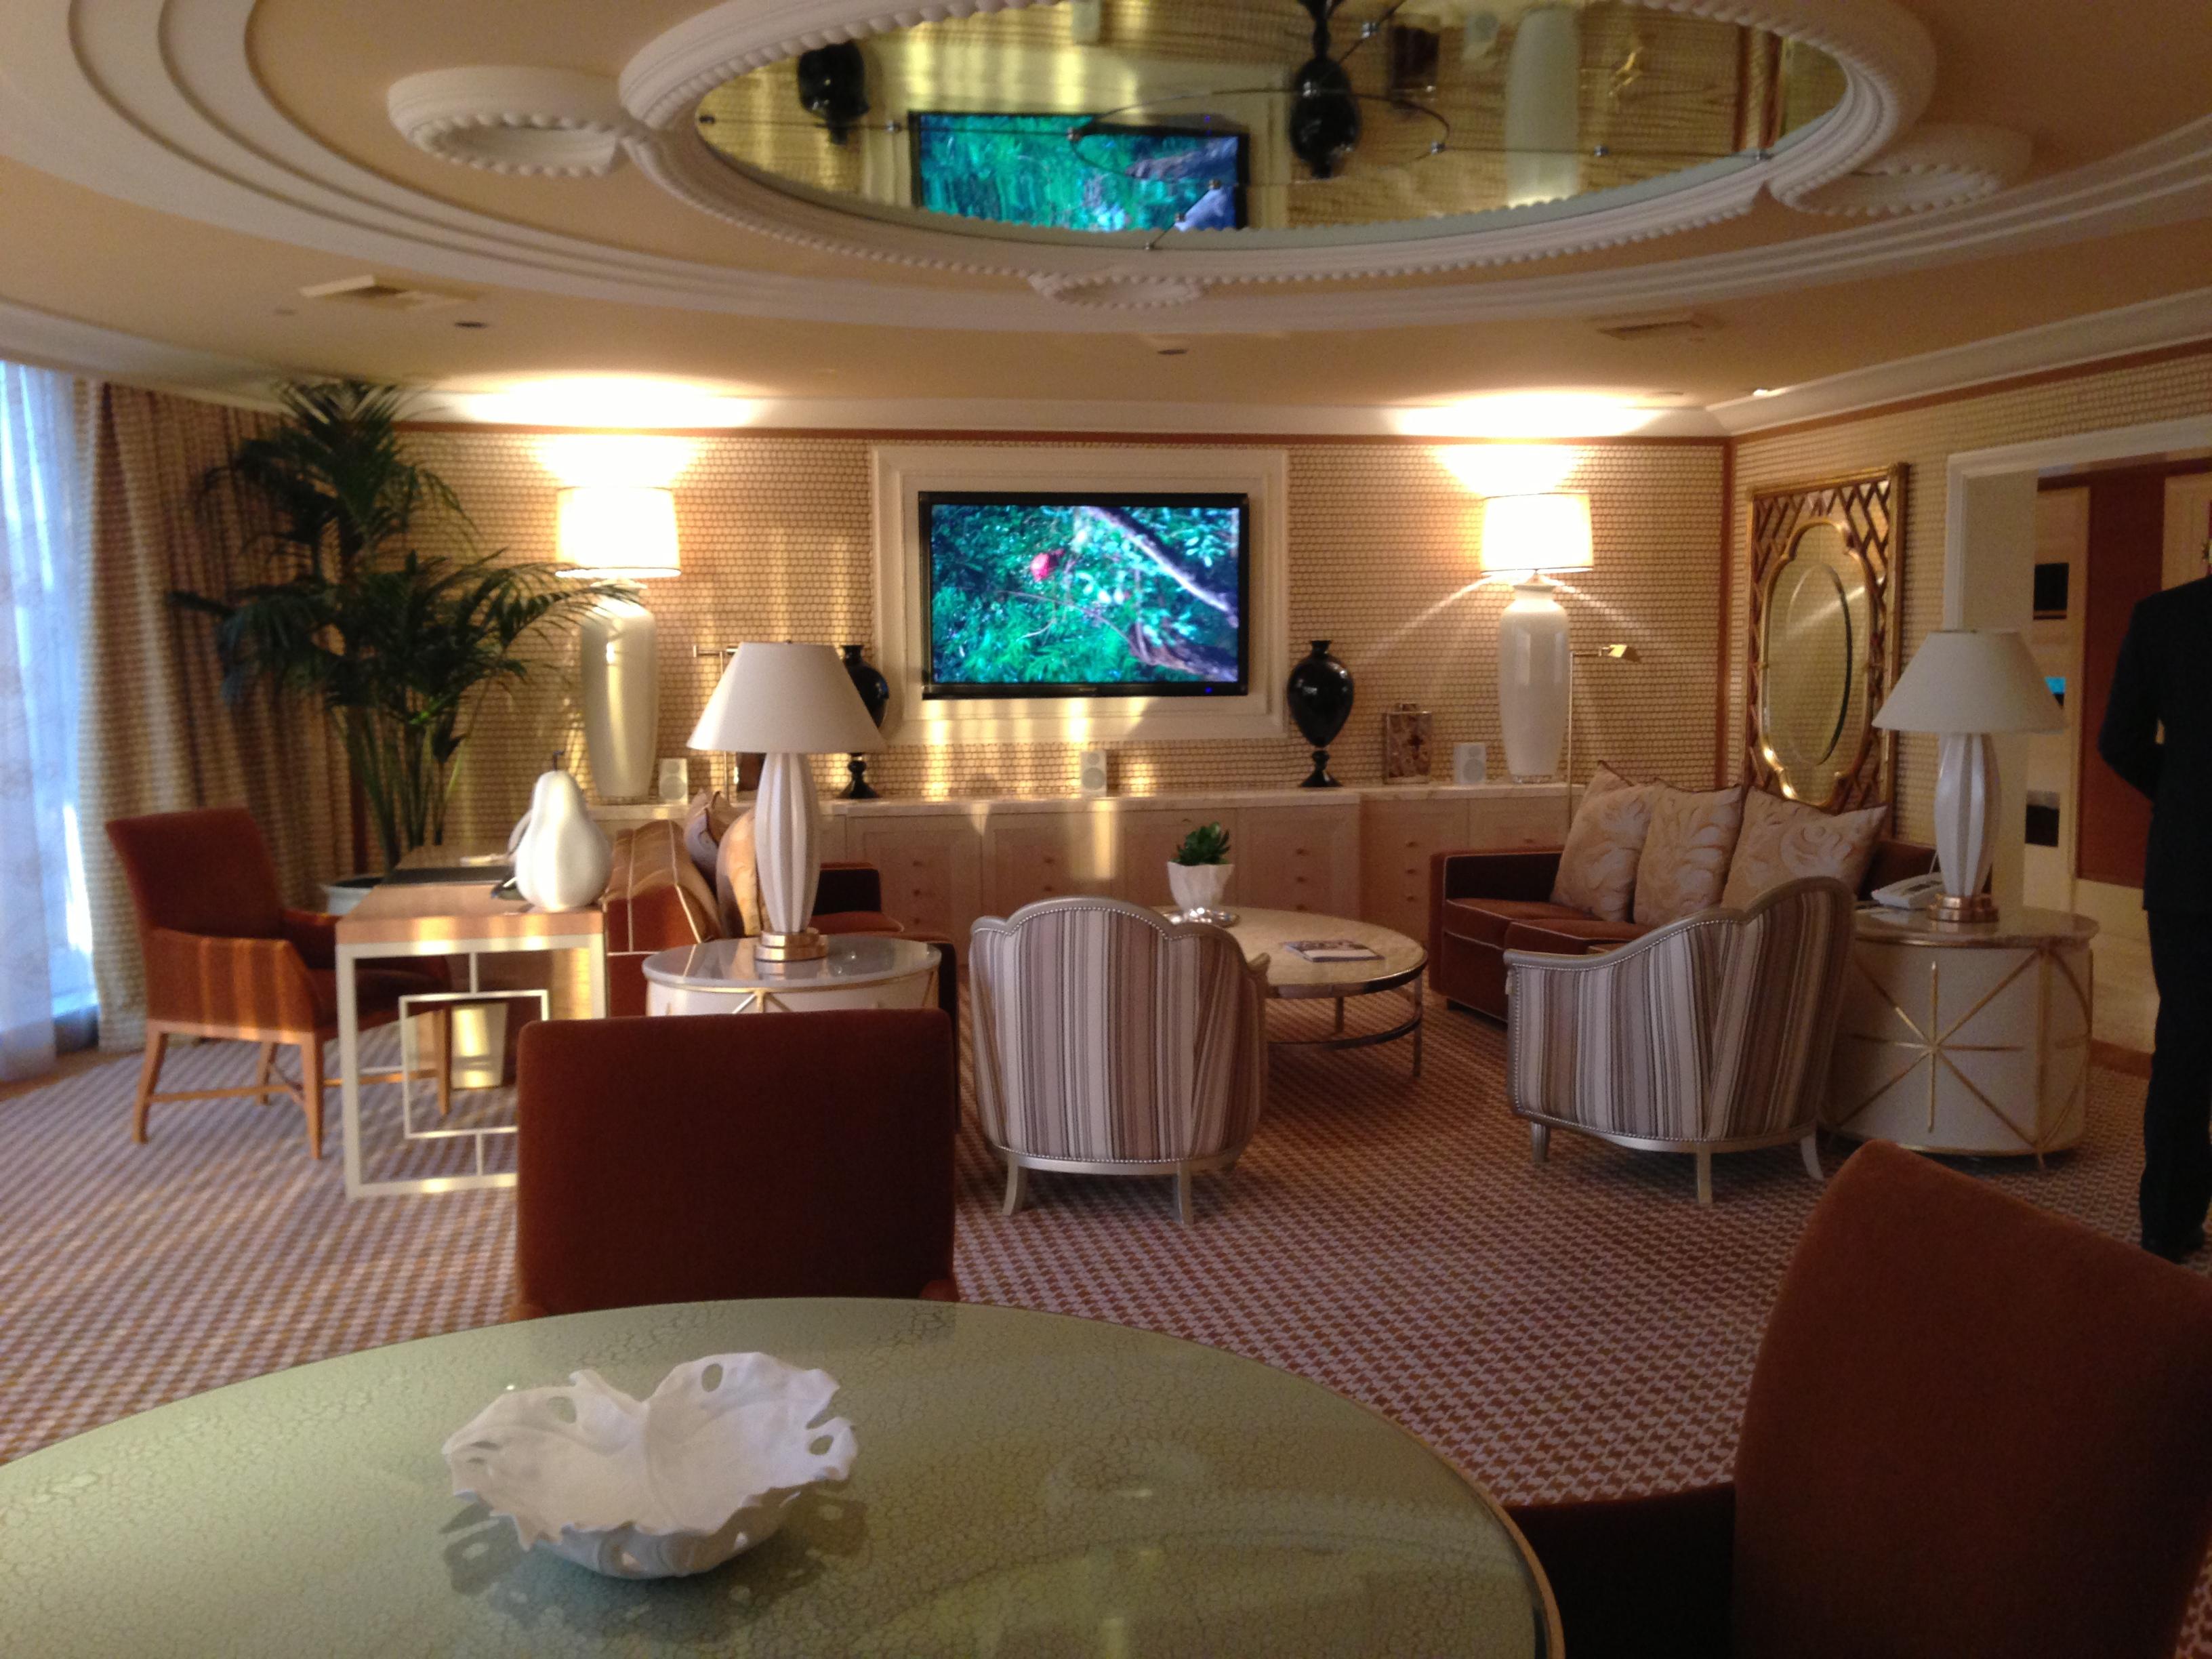 Vegas 2 Bedroom Suite Deals Extreme Hotel Suites In Vegas High Roller Suites  Vegas